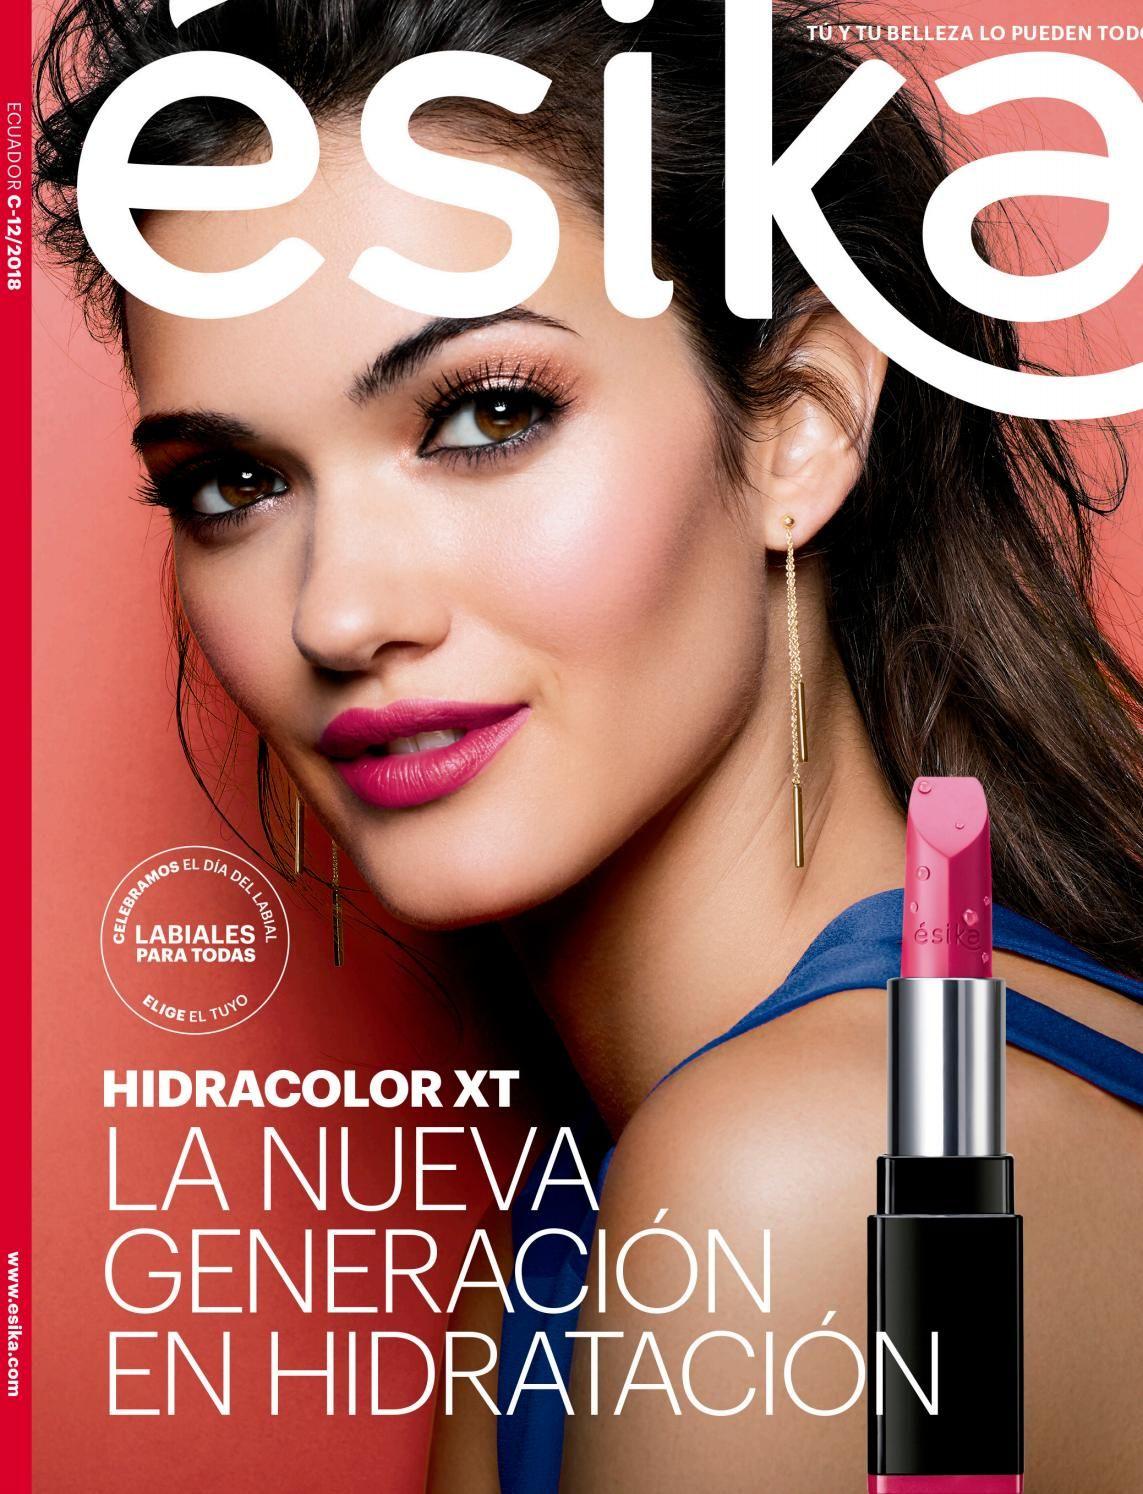 Catálogo ésika Ecuador C12 Make It Simple Digital Publishing Beauty